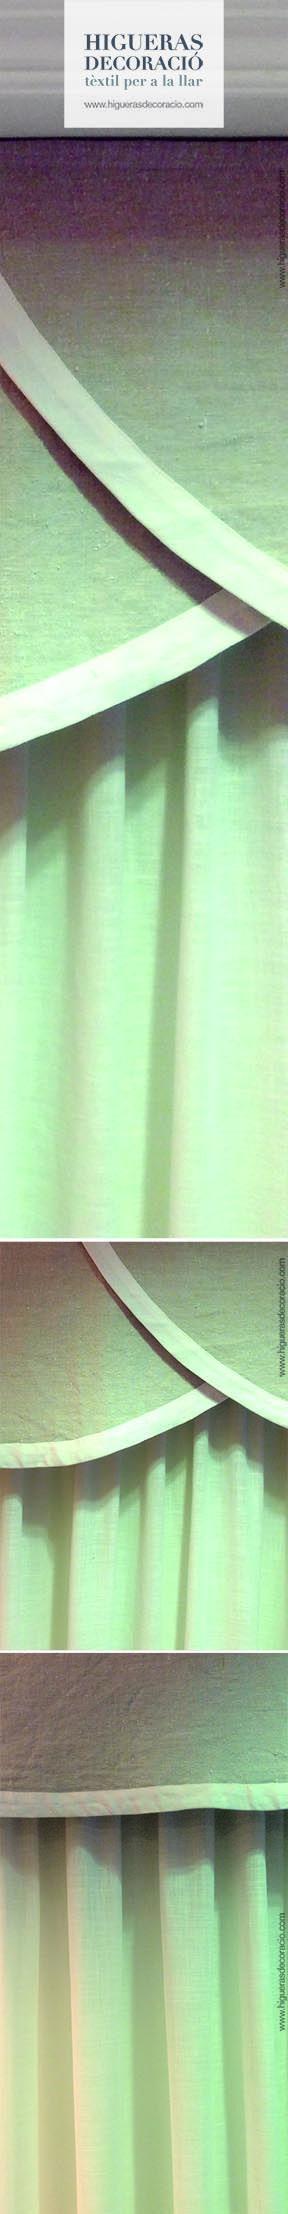 cortina con faldn faldn de lino con forma para tus cortinas